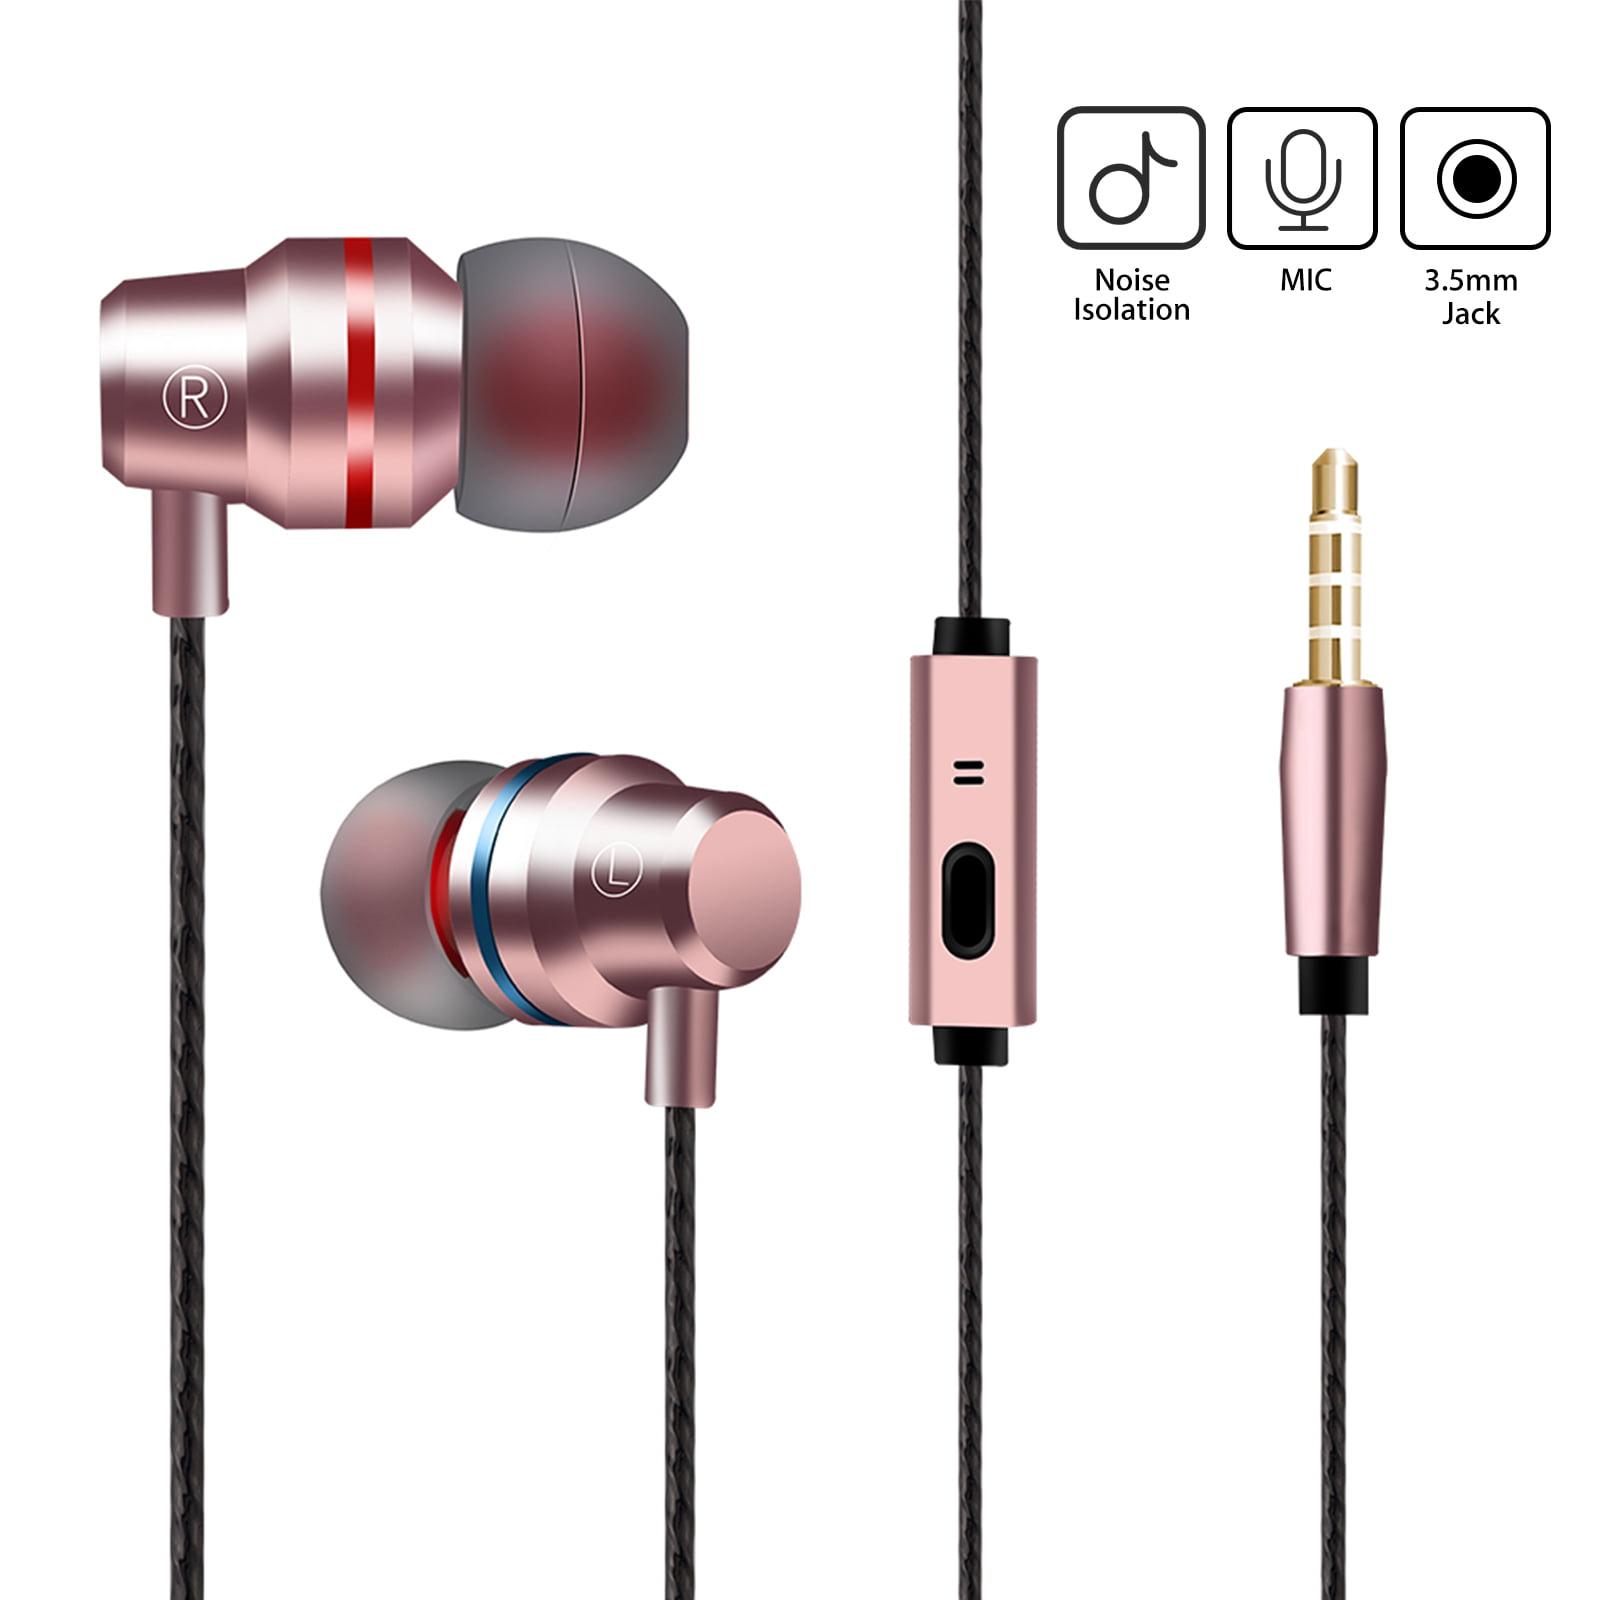 True Bass Stereo Headphone Earphone Sport Headset Hands Free Earbuds With Mic